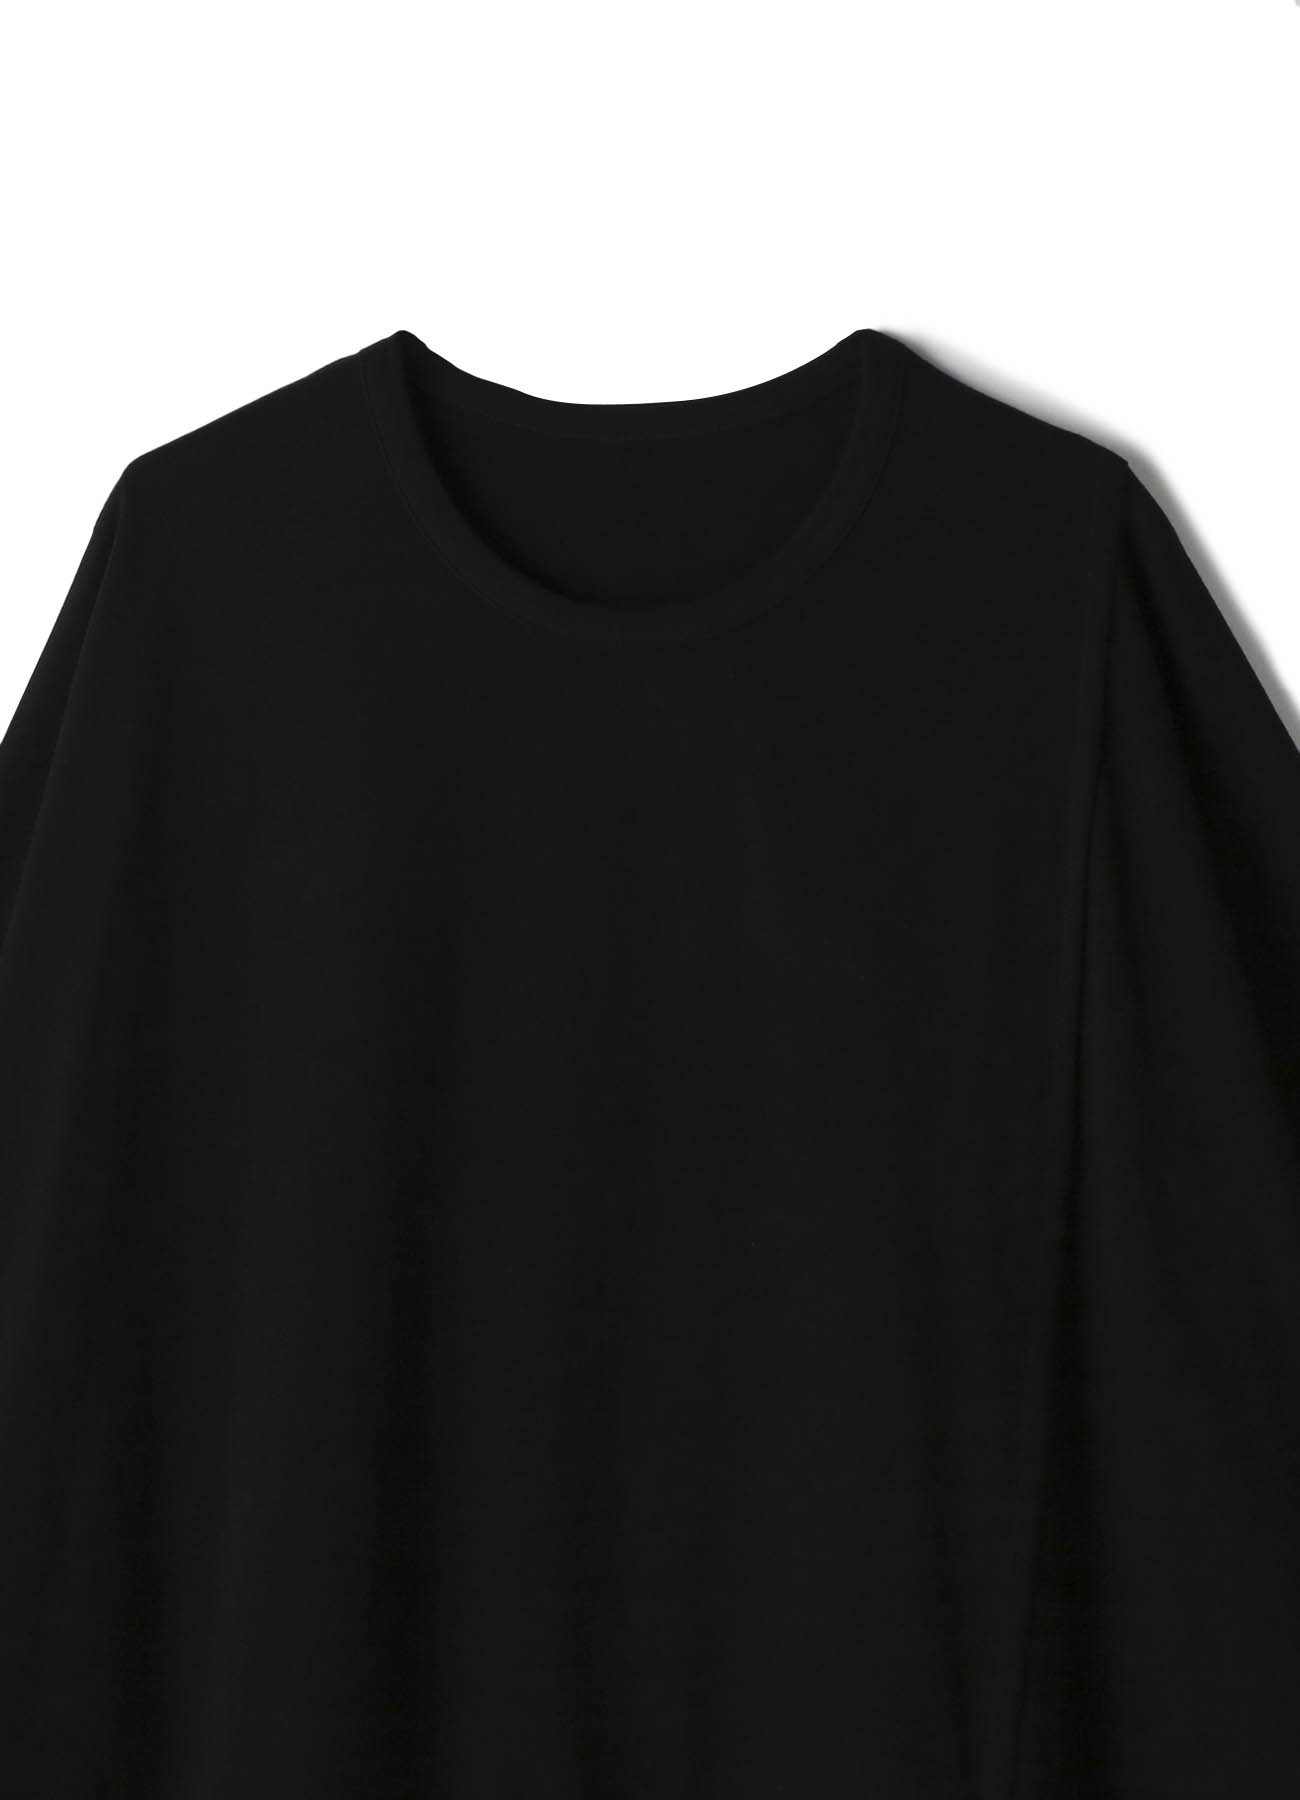 30/cotton Jersey Snap slit Short Cut Sew